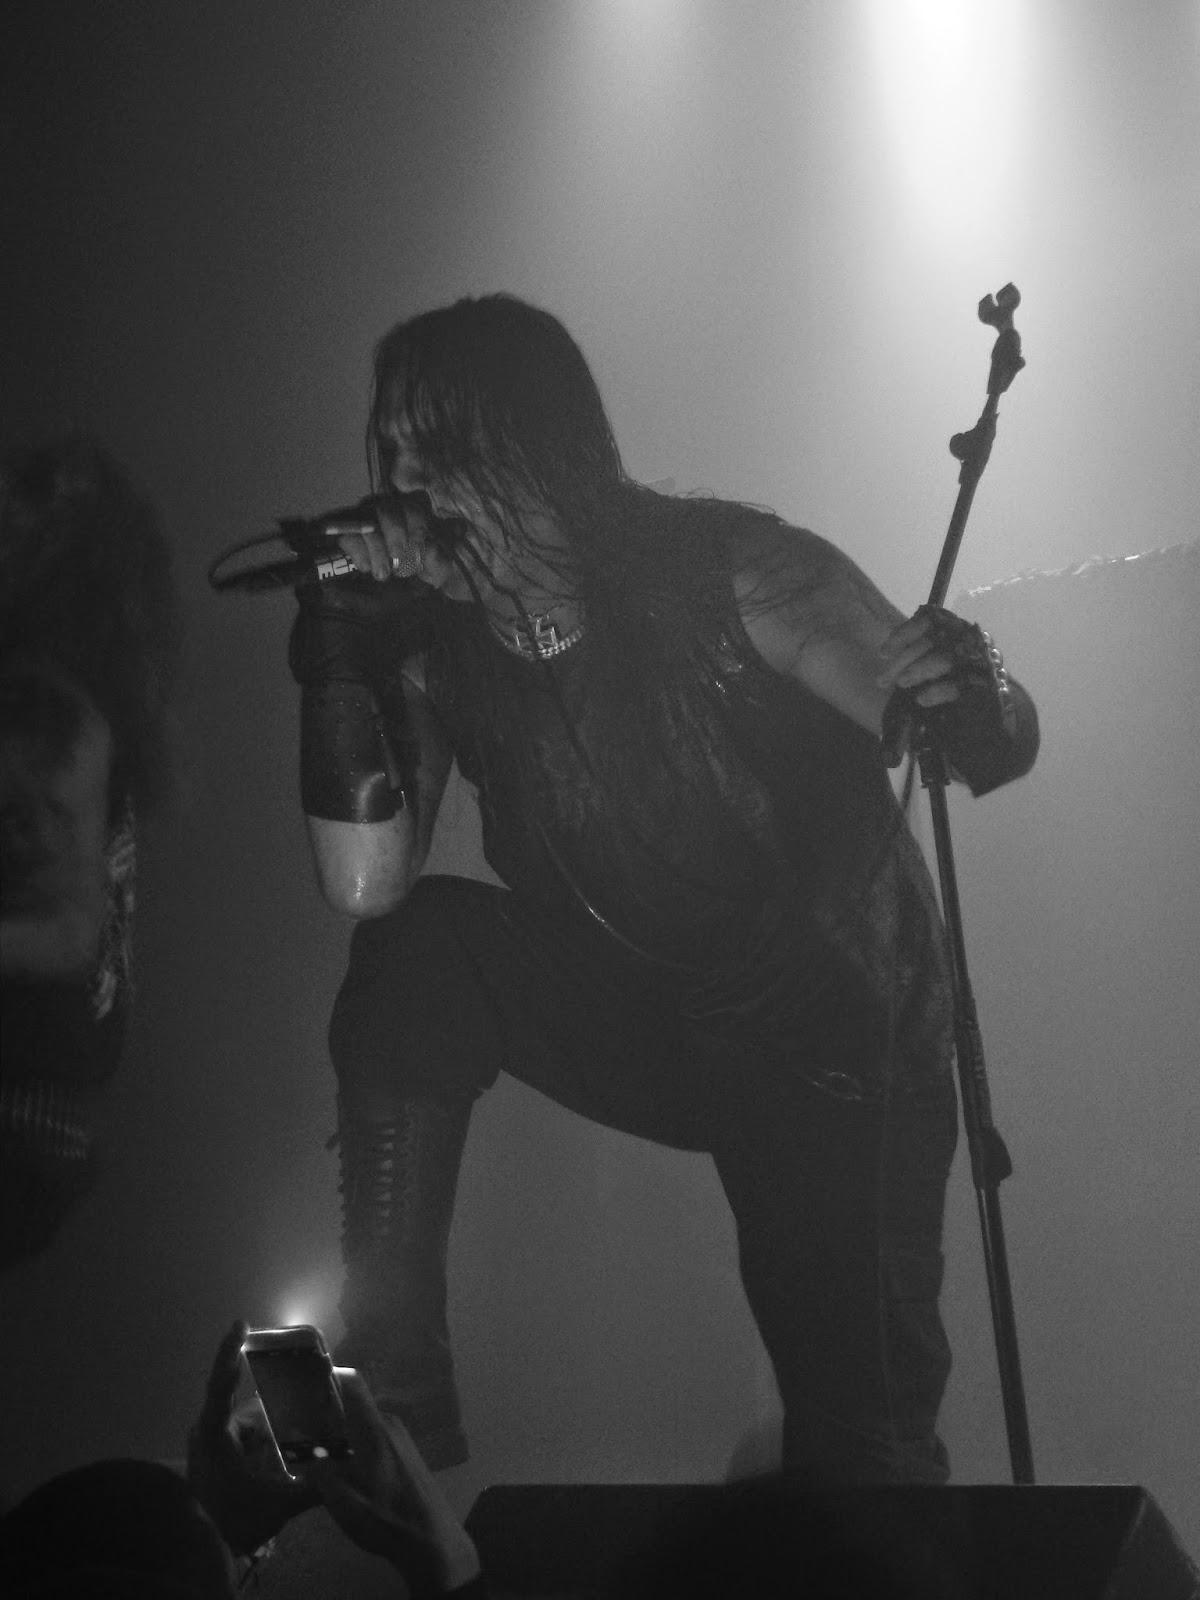 https://www.flickr.com/photos/unlimitedrockmagazine/